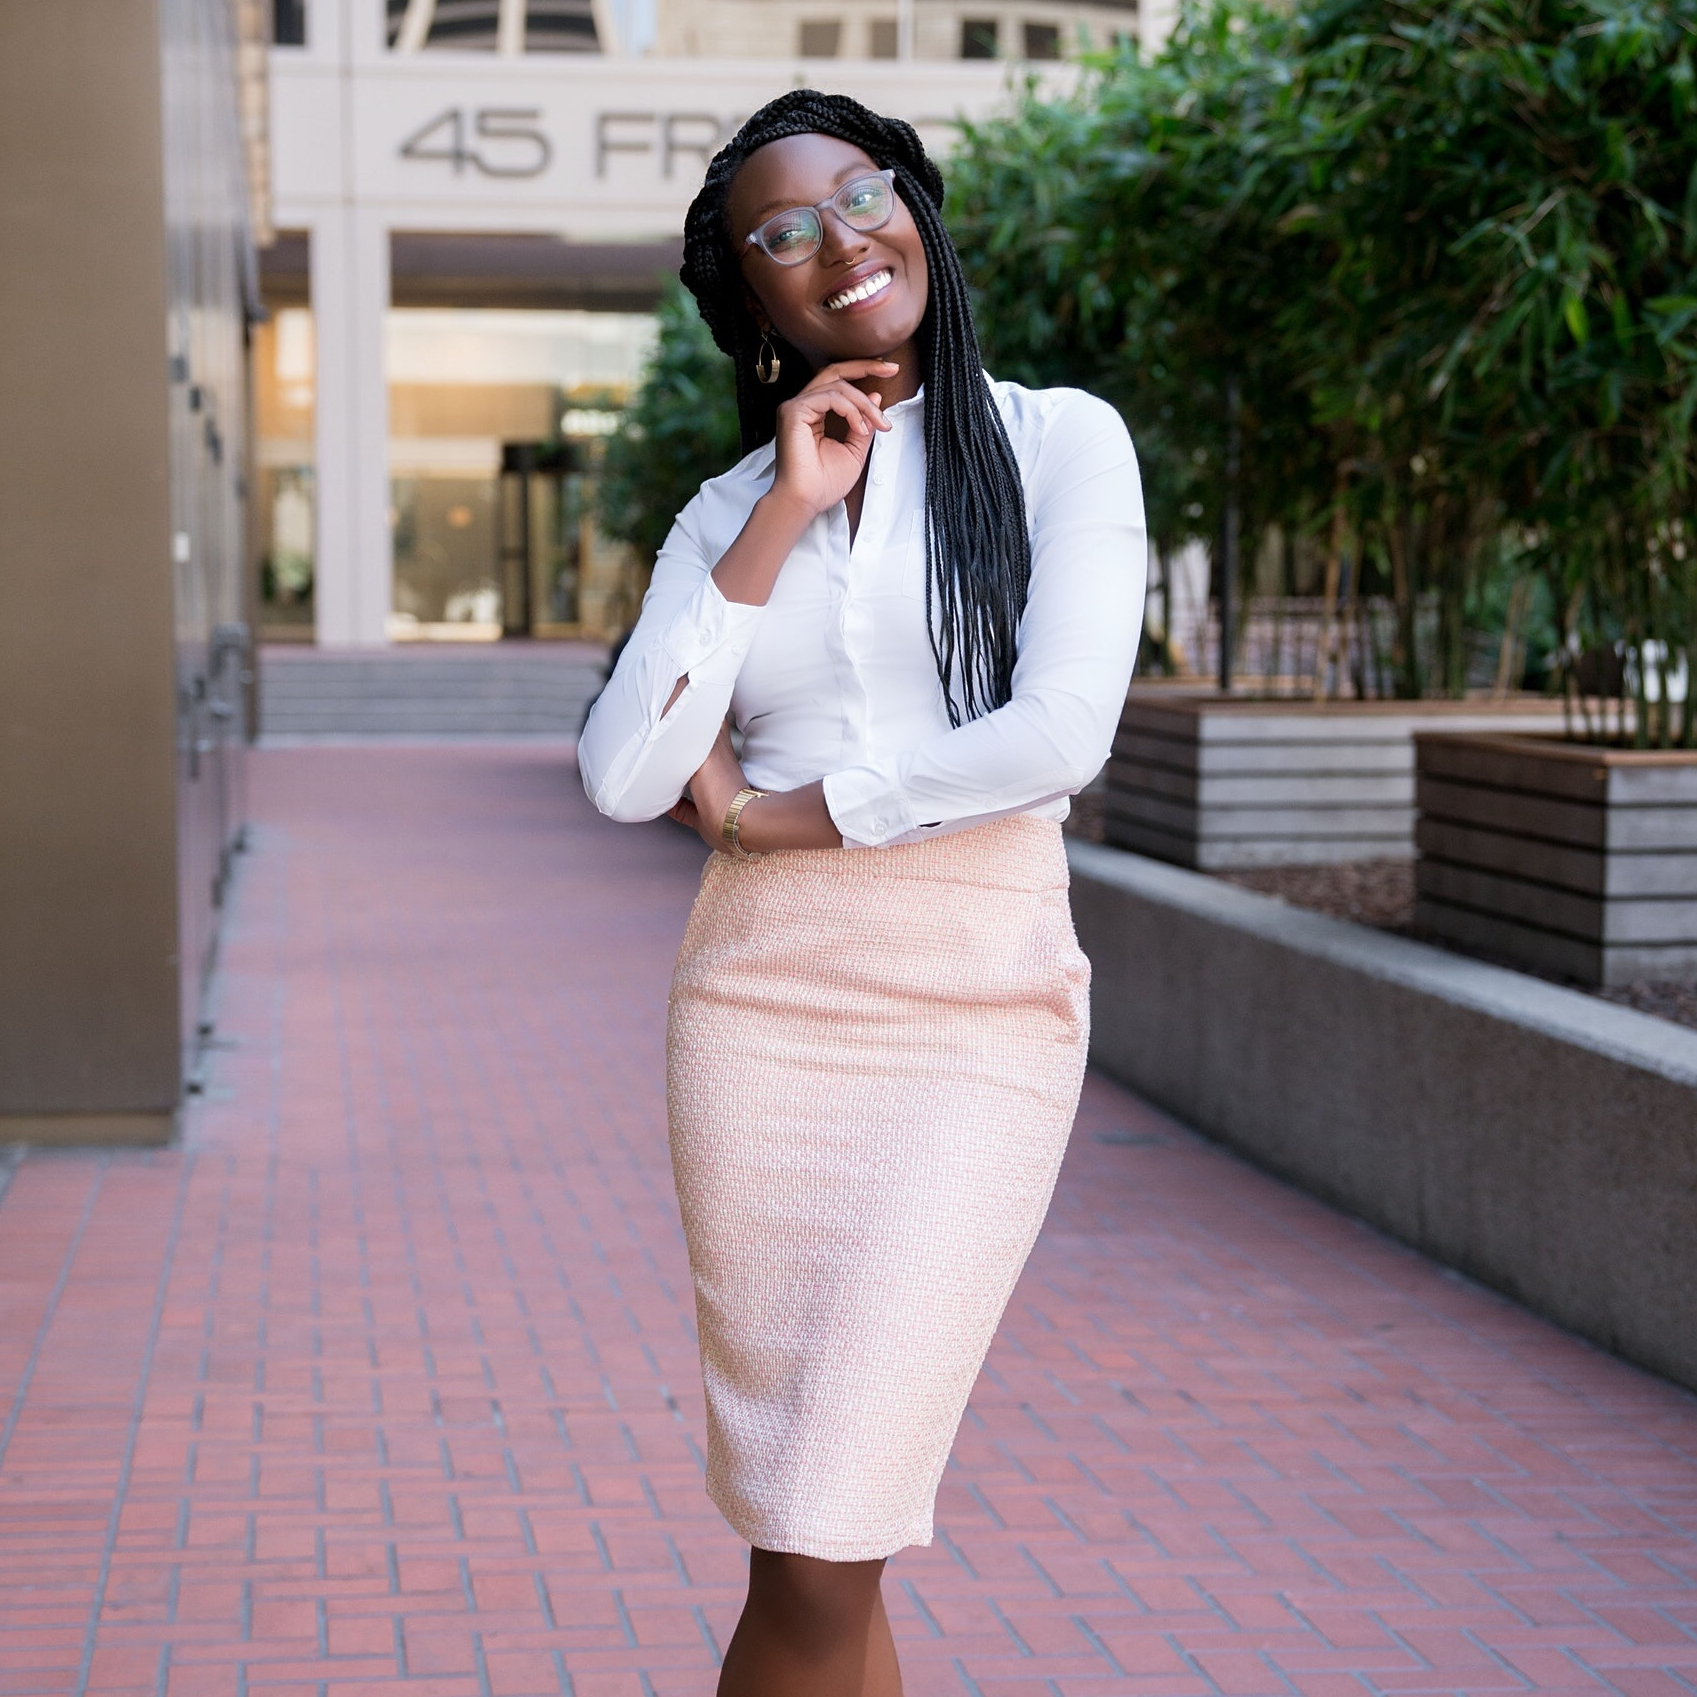 Pink tweed skirt for work